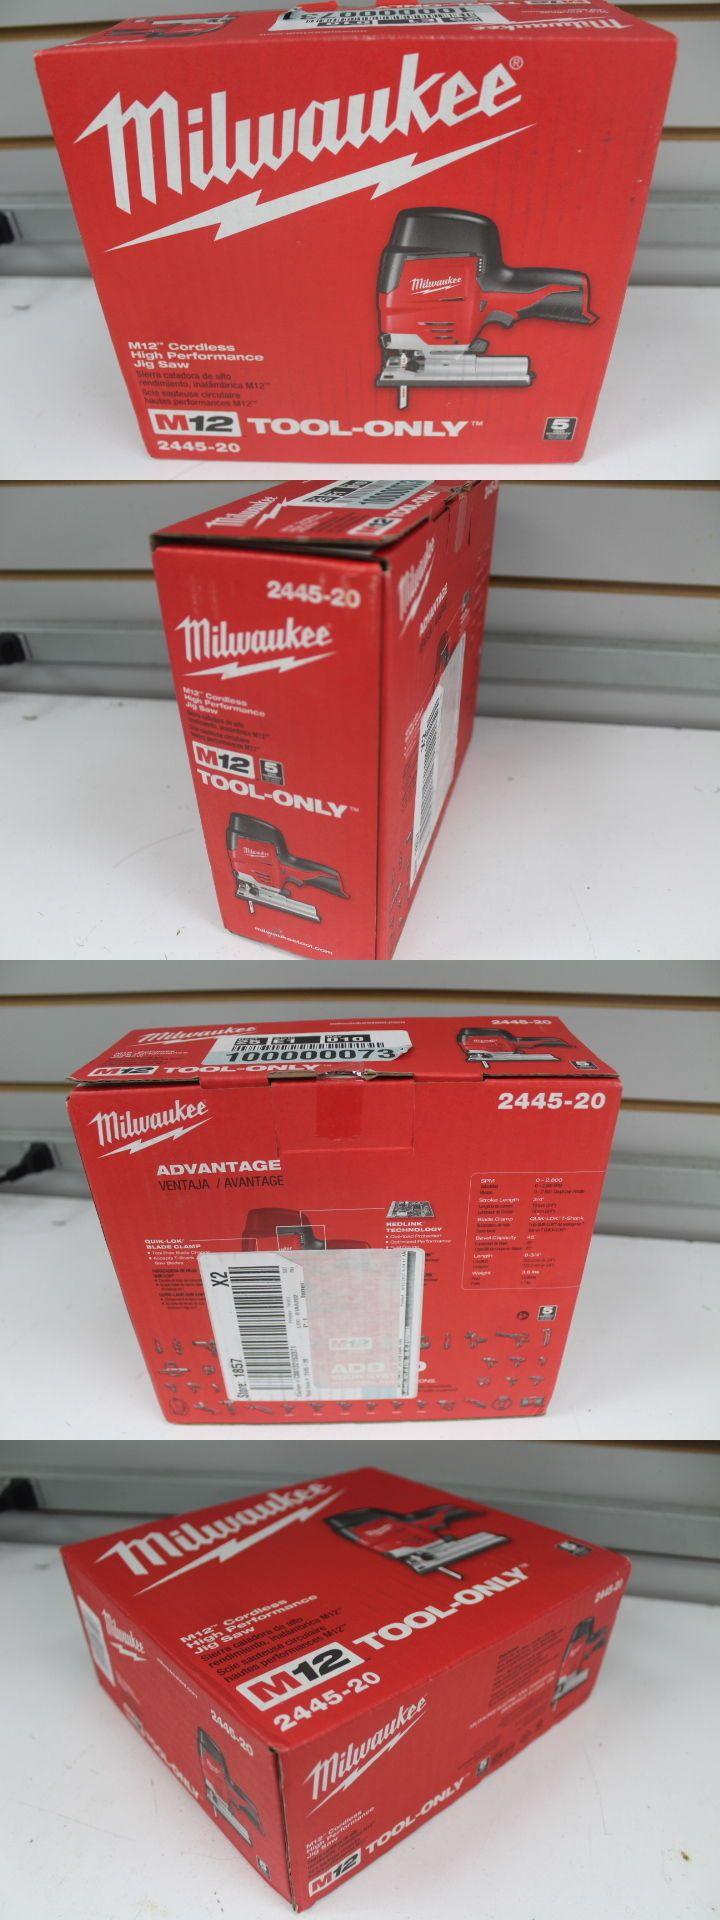 Jig and Scroll Saws 122834: Milwaukee M12 12V Li-Ion High Performance Hybrid Grip Jigsaw 2445-20 New Tool On -> BUY IT NOW ONLY: $87 on eBay!